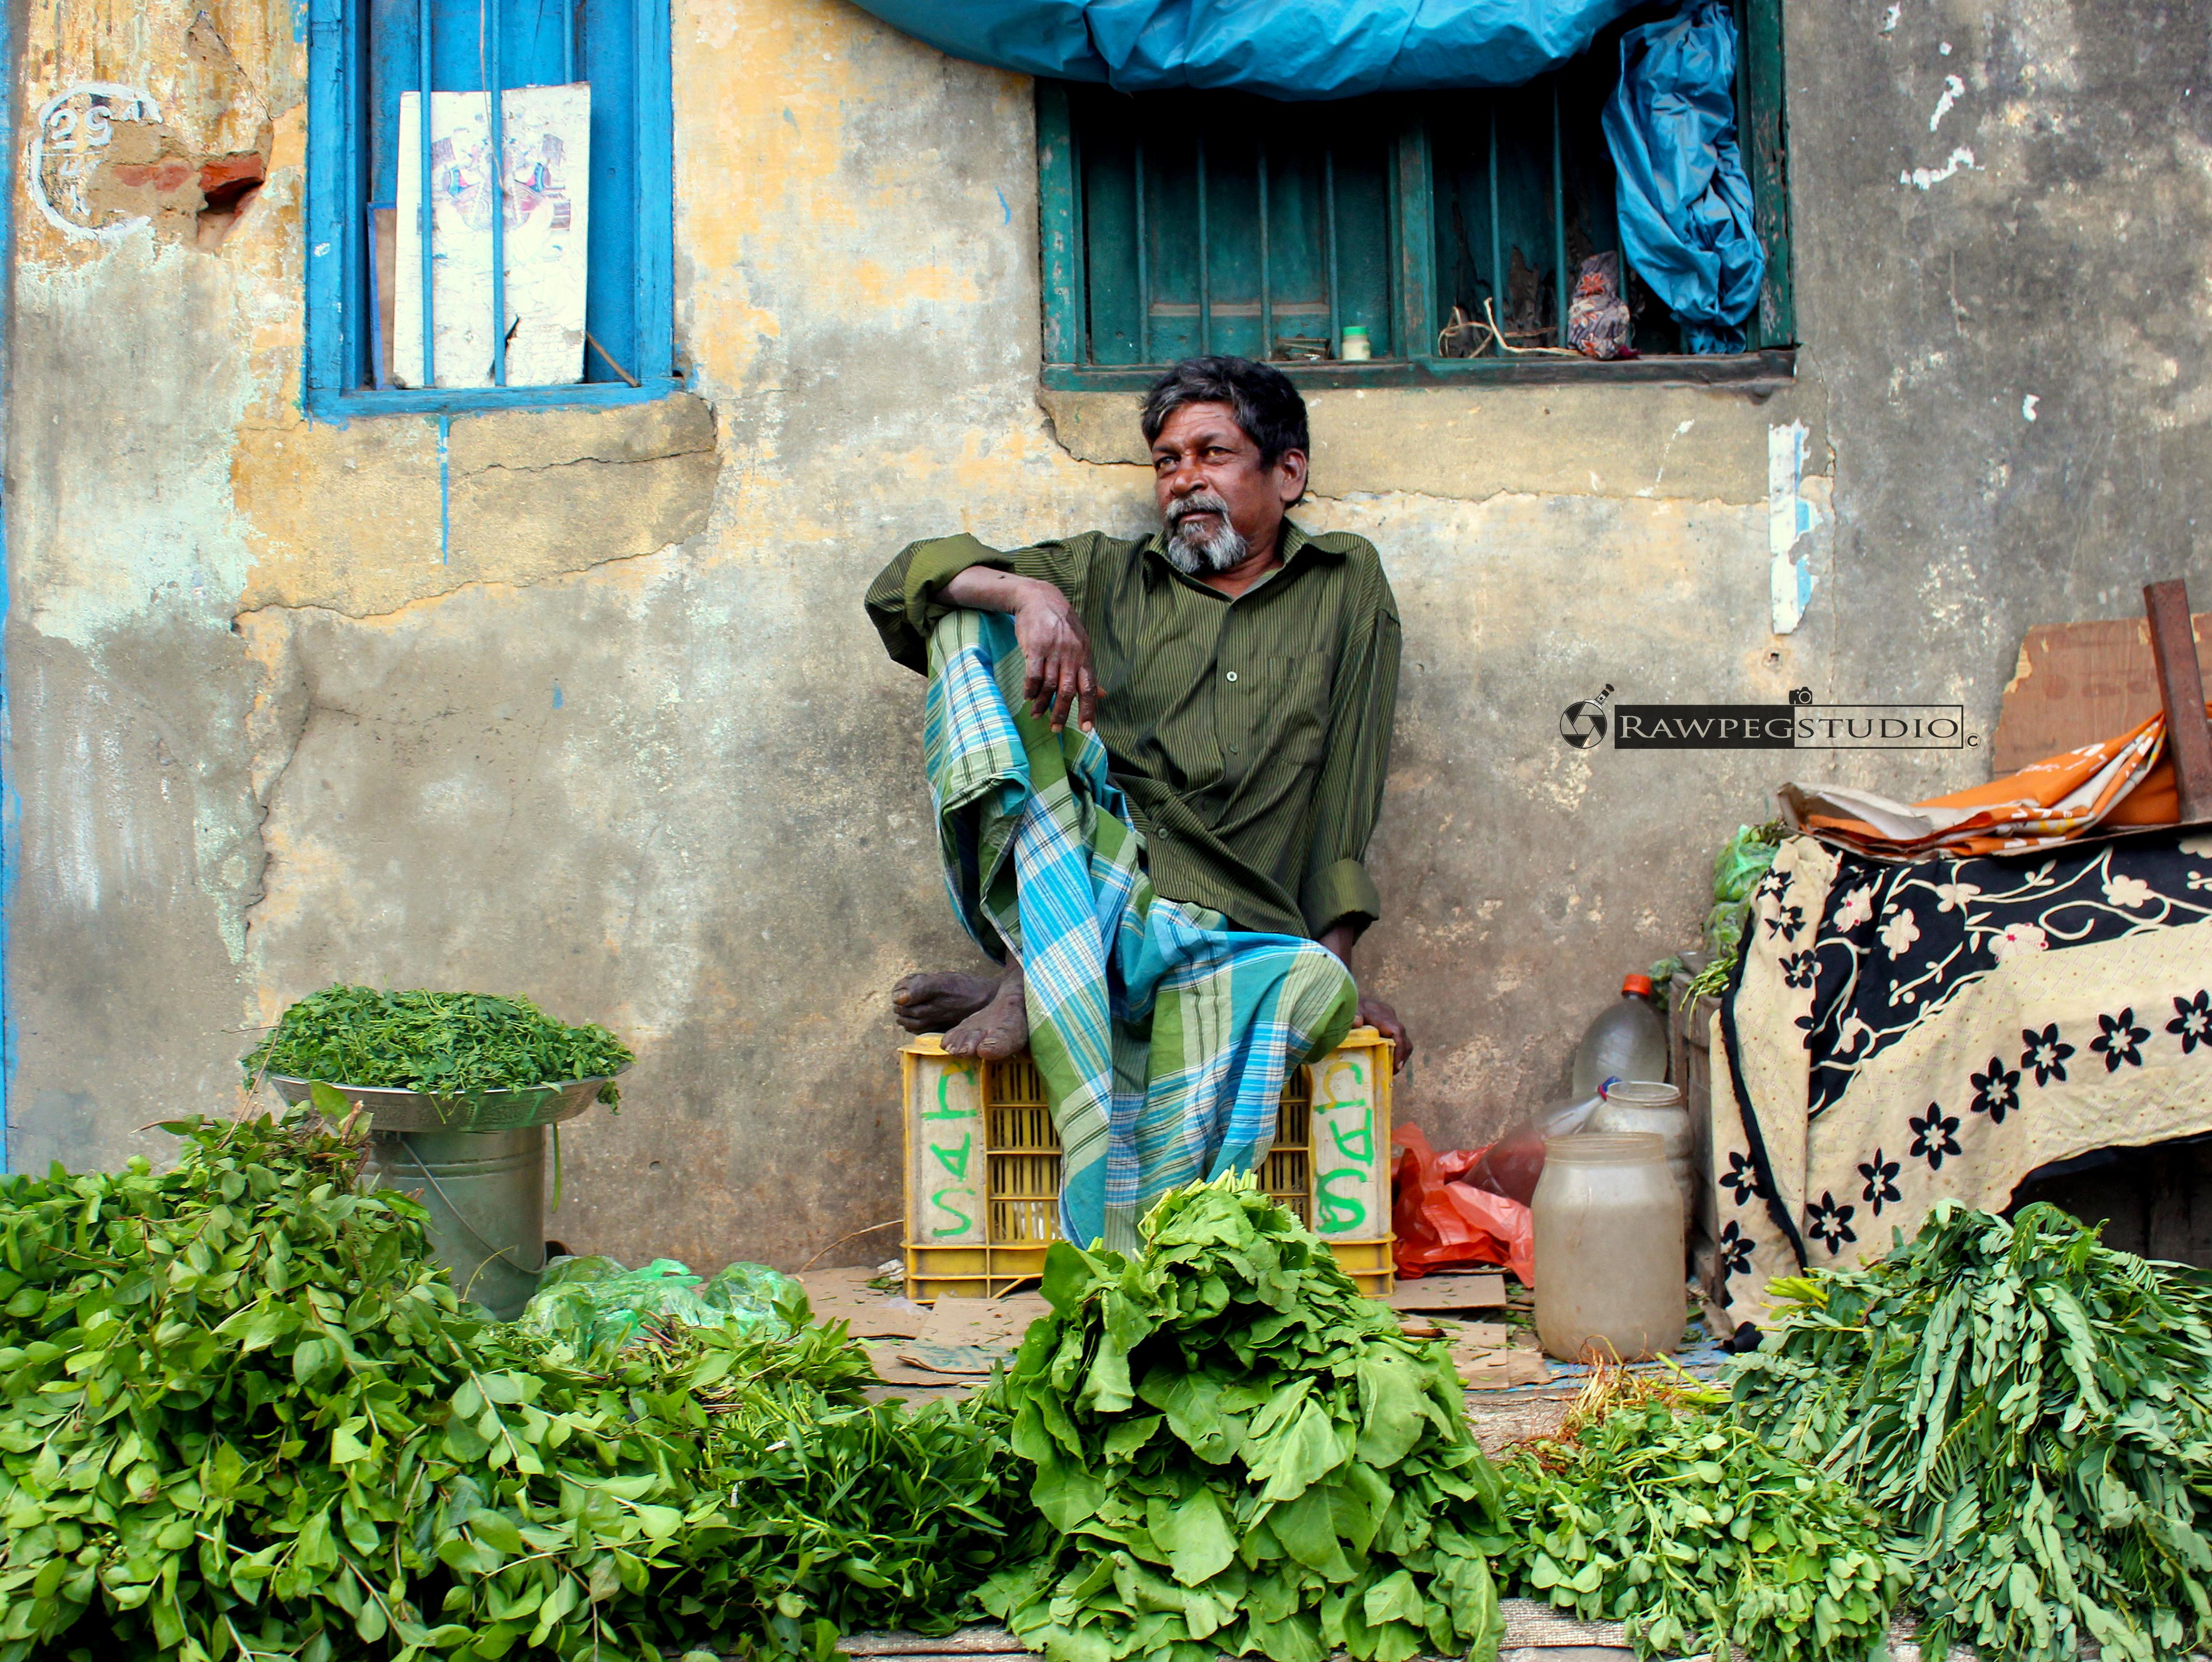 #rawpegstudio#india#groceryman